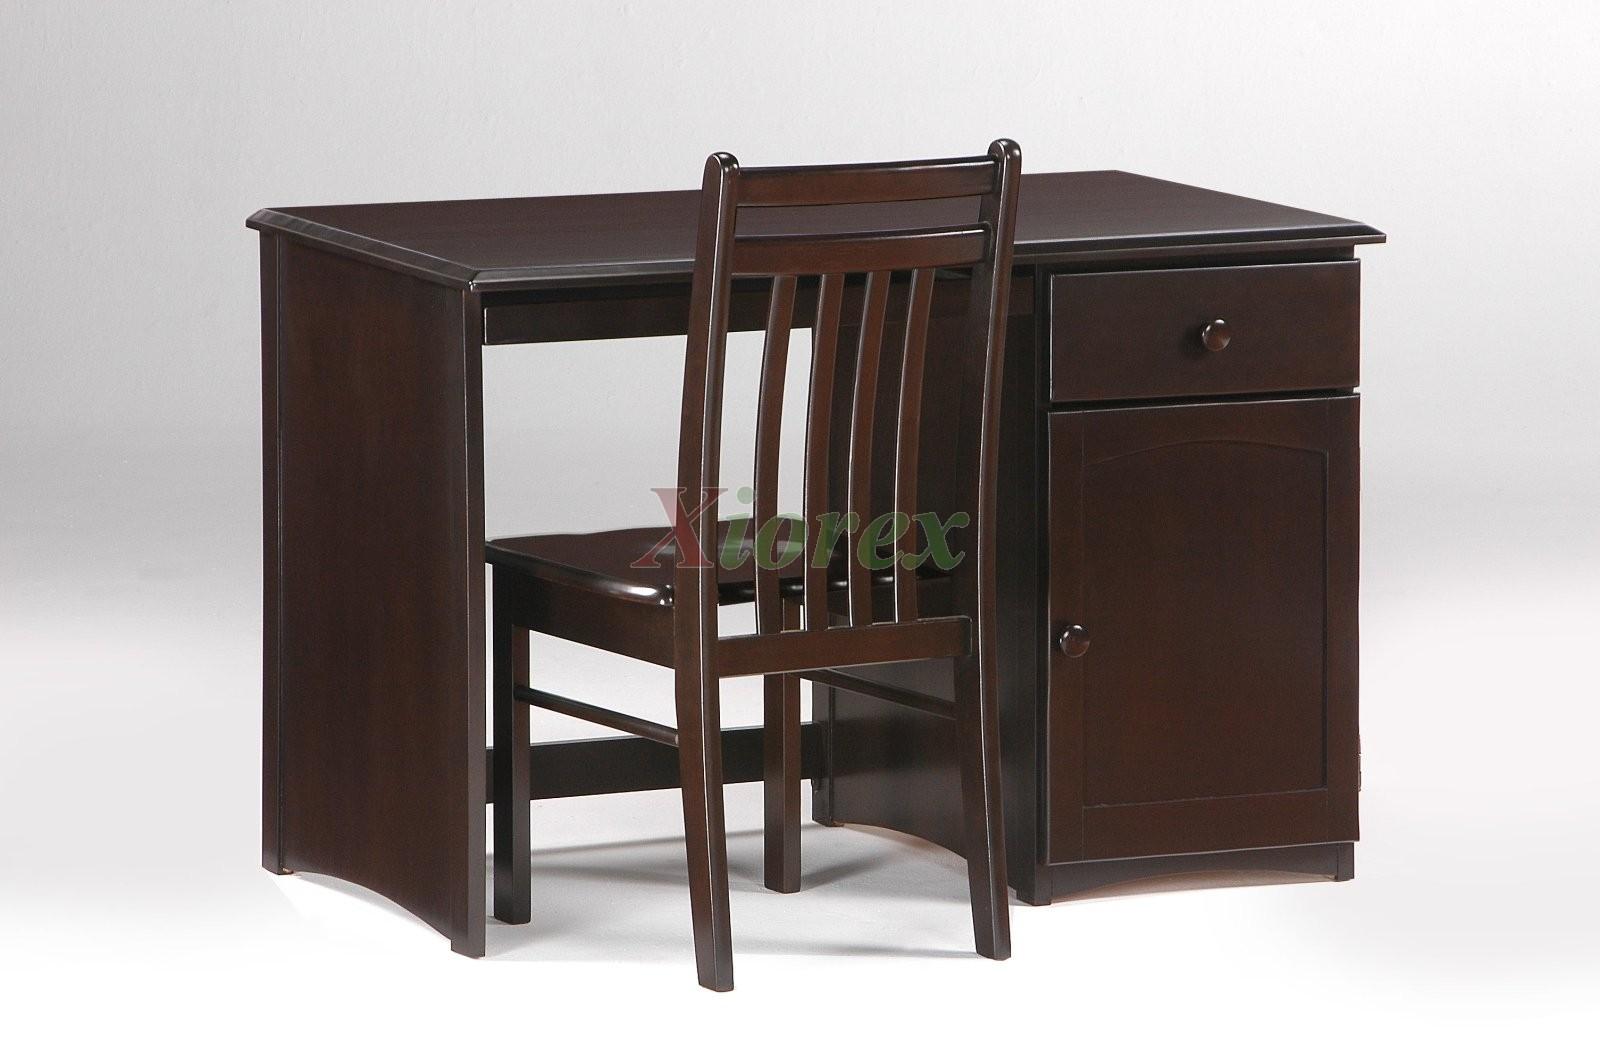 Clove Student Desk Chair Dark Chocolate For N D Es Bed Sets Xiorex